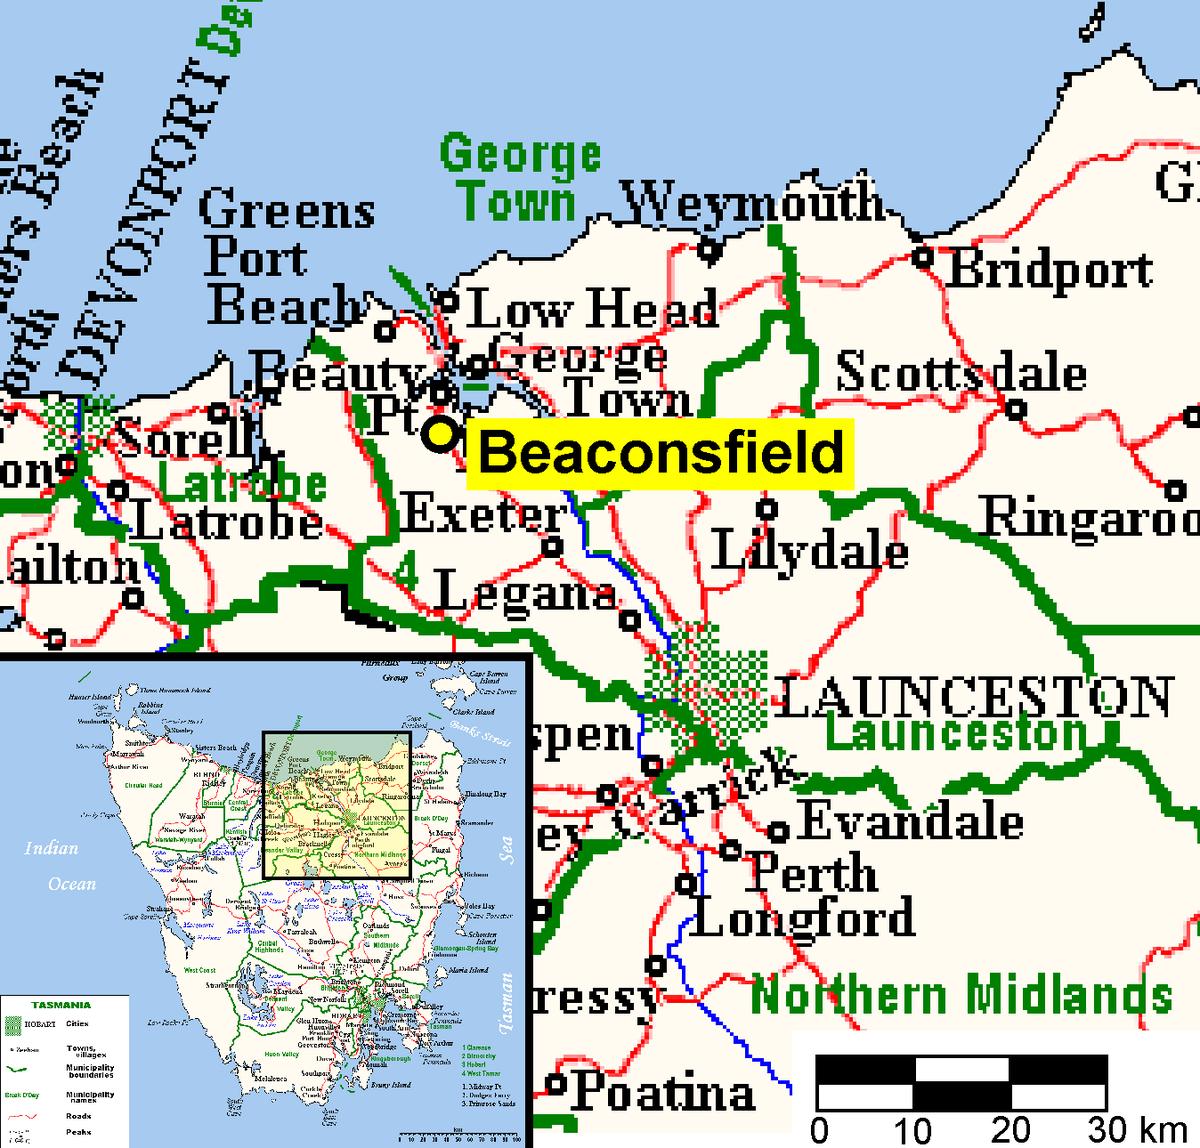 Beaconsfield Mine collapse - Wikipedia